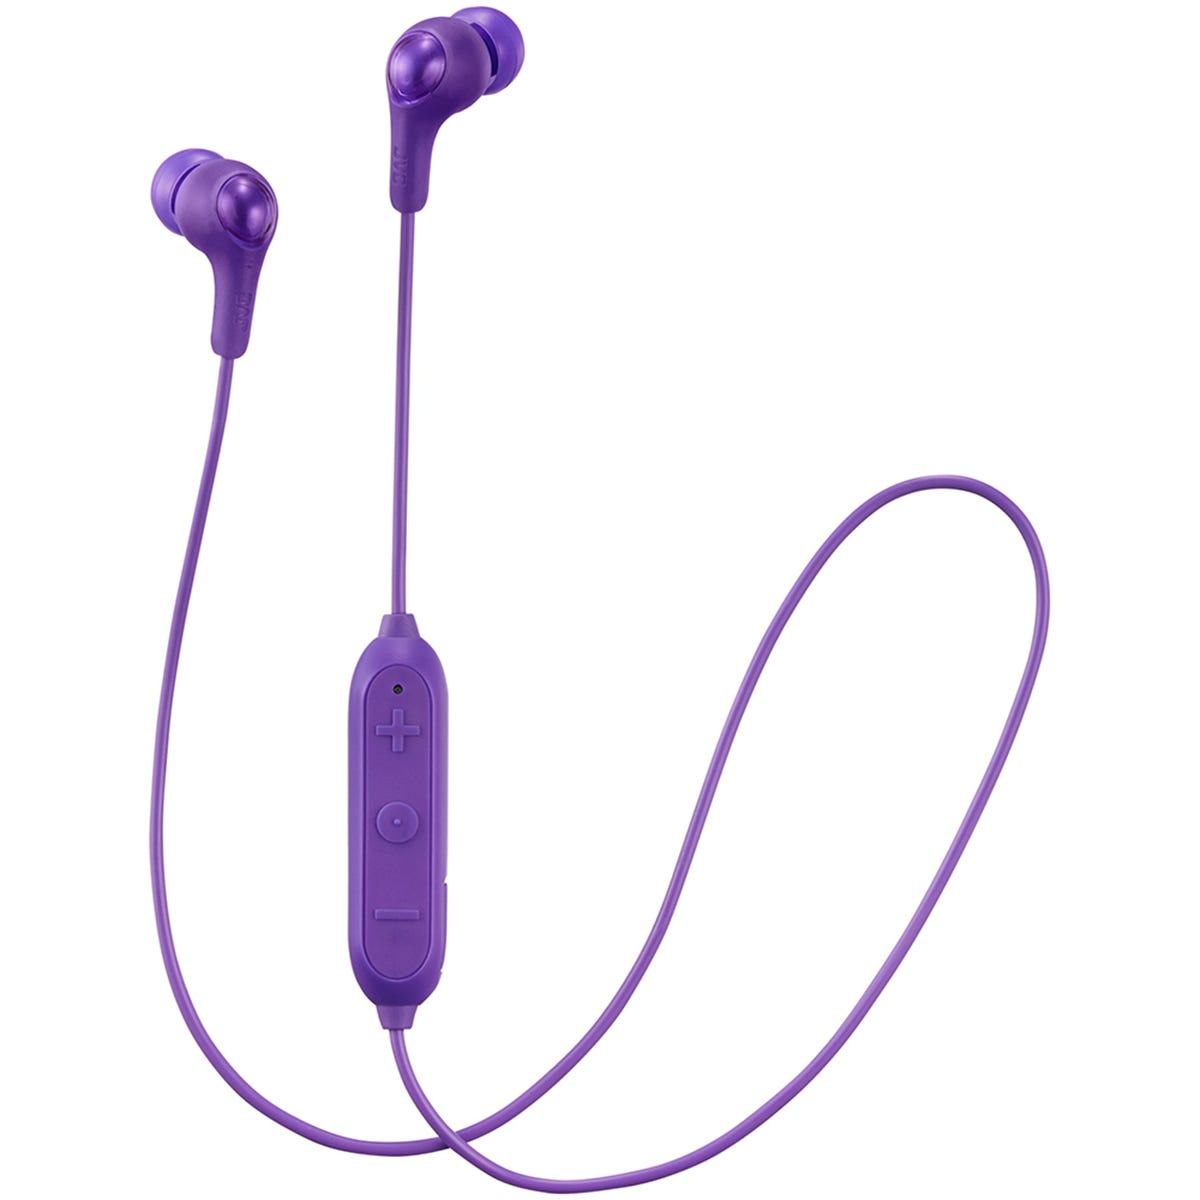 JVC Gumy Wireless Bluetooth In Ear Headphones - Violet